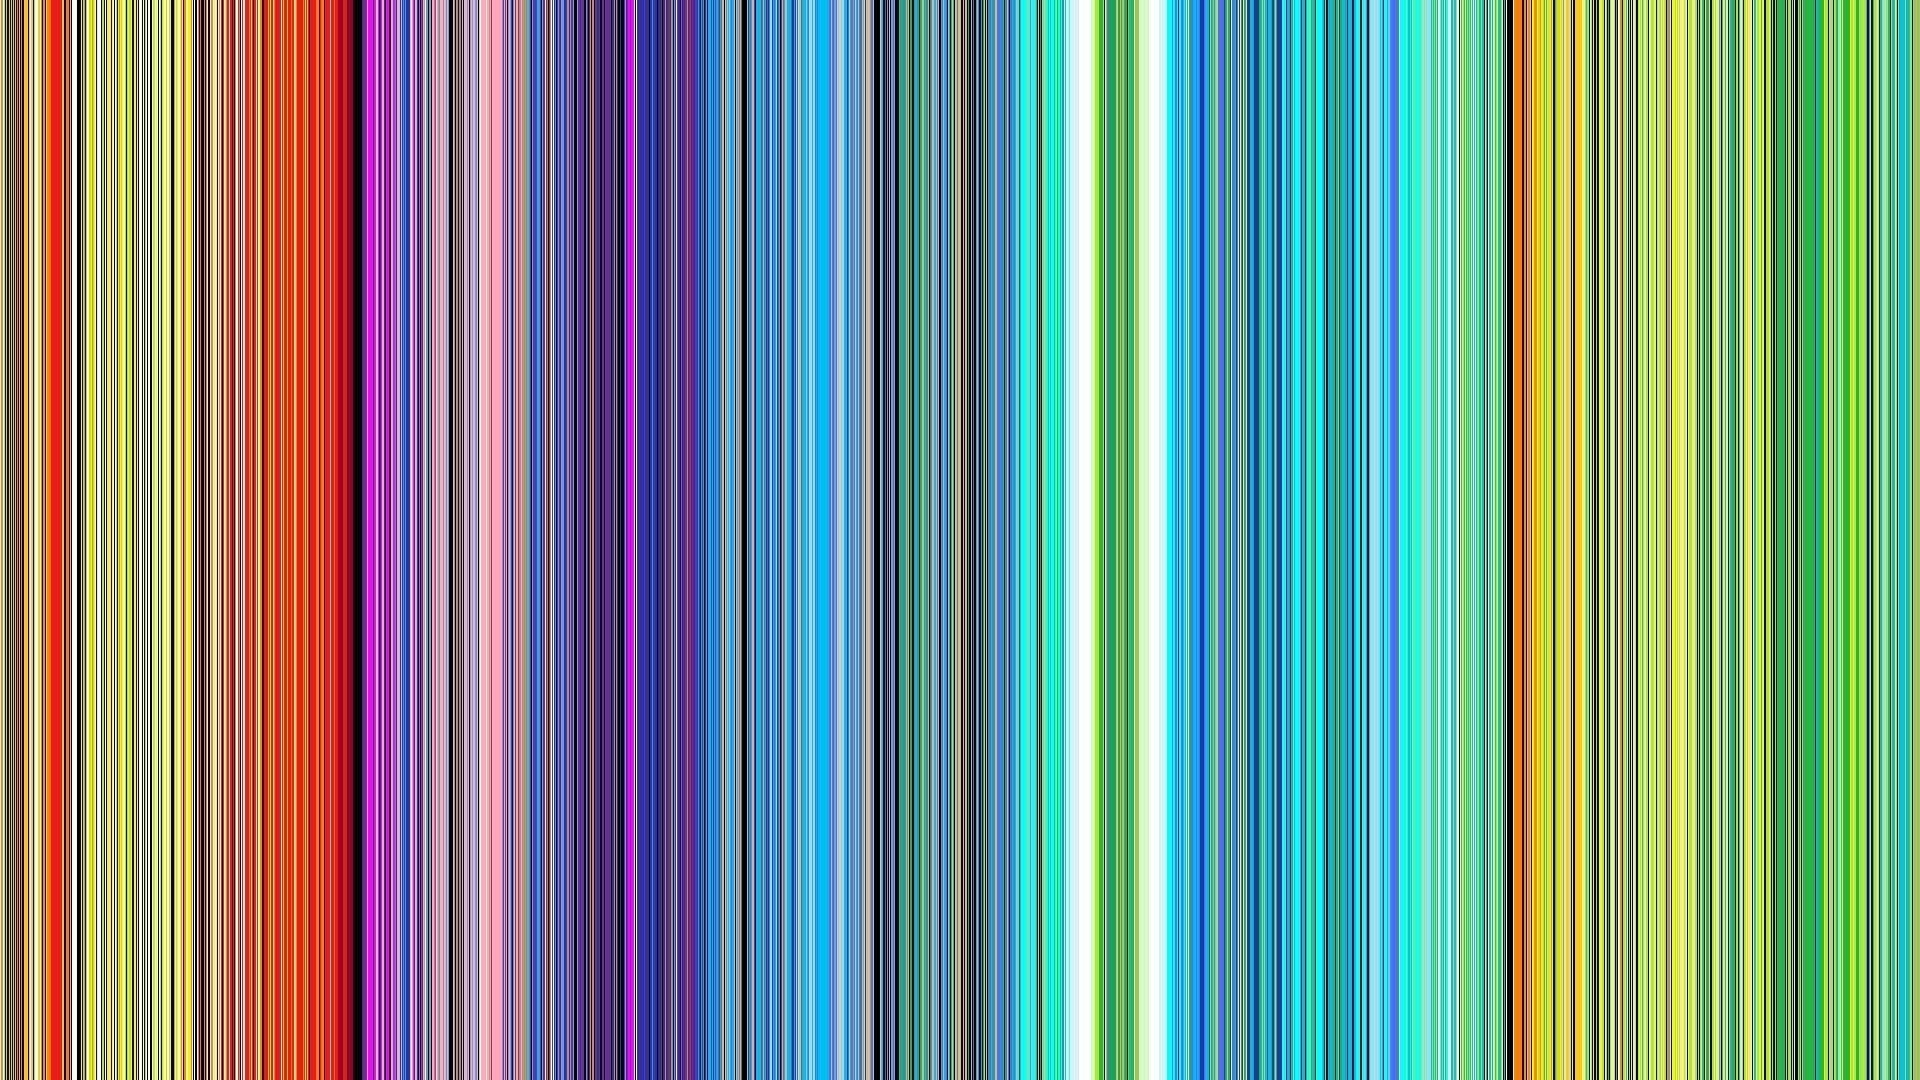 Vertical colors line plain wallpapers HD Wallpapers Rocks 1920x1080